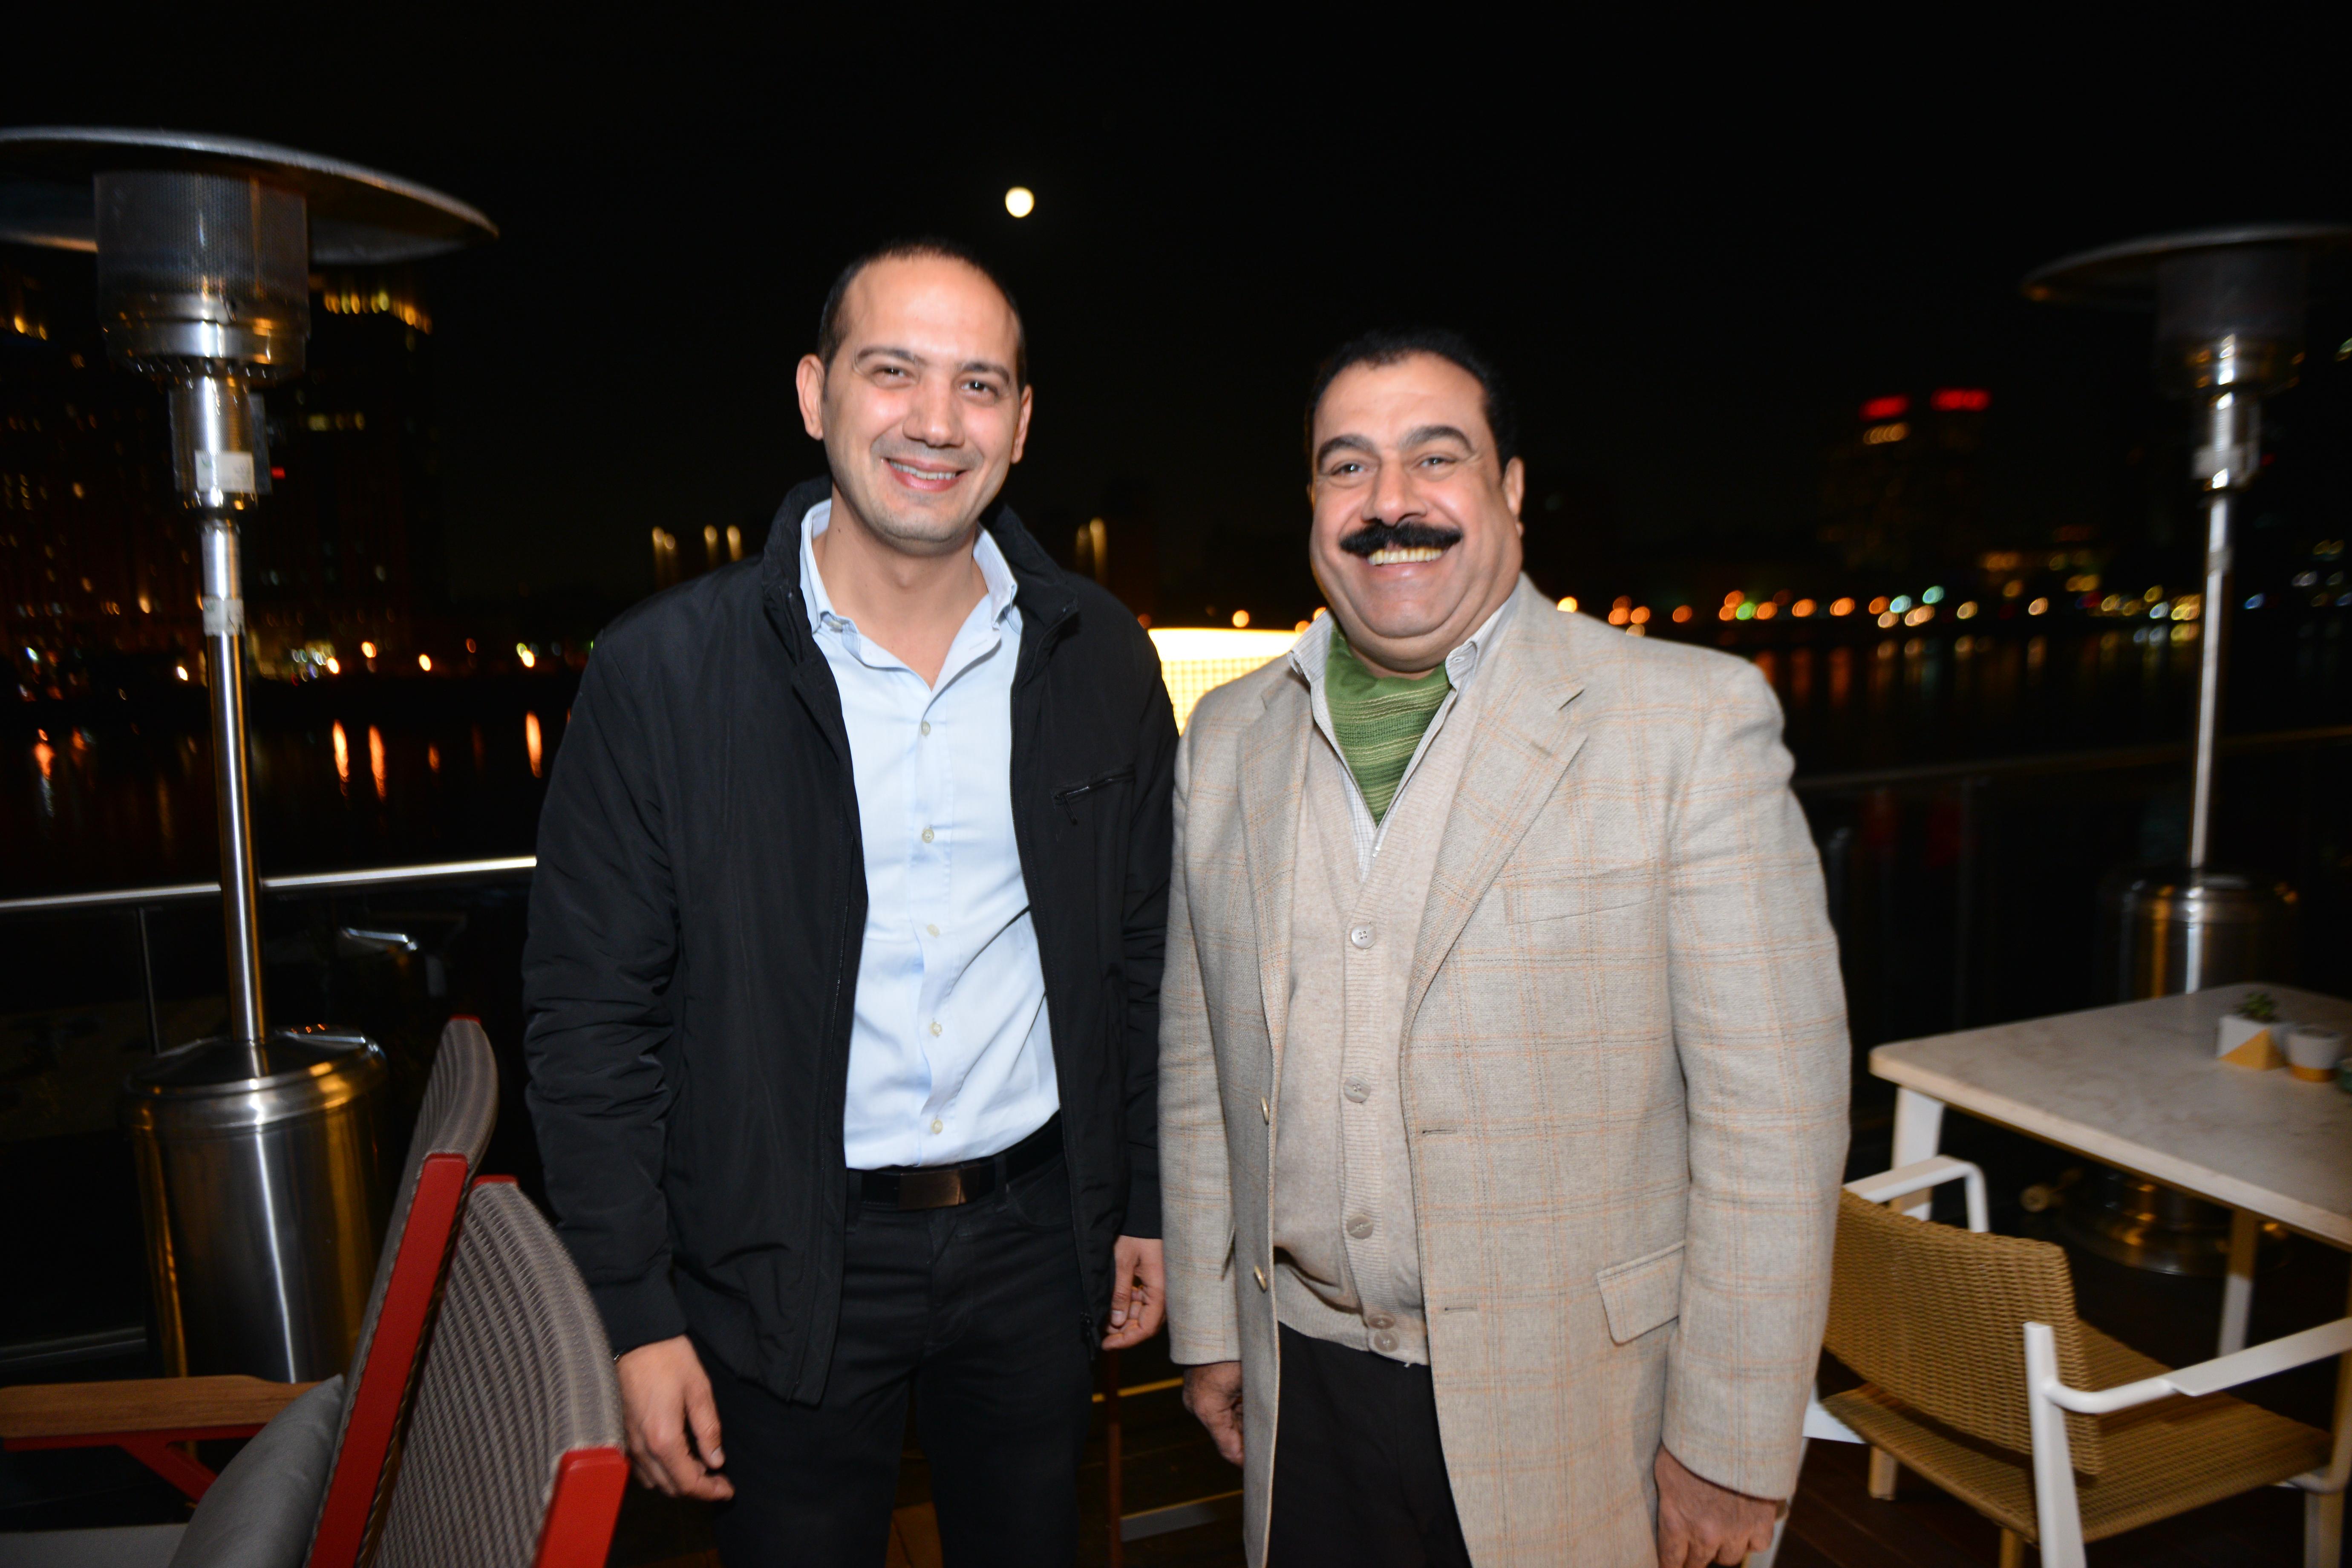 Mr. Amr Assem & Mr. Gamal Morgan